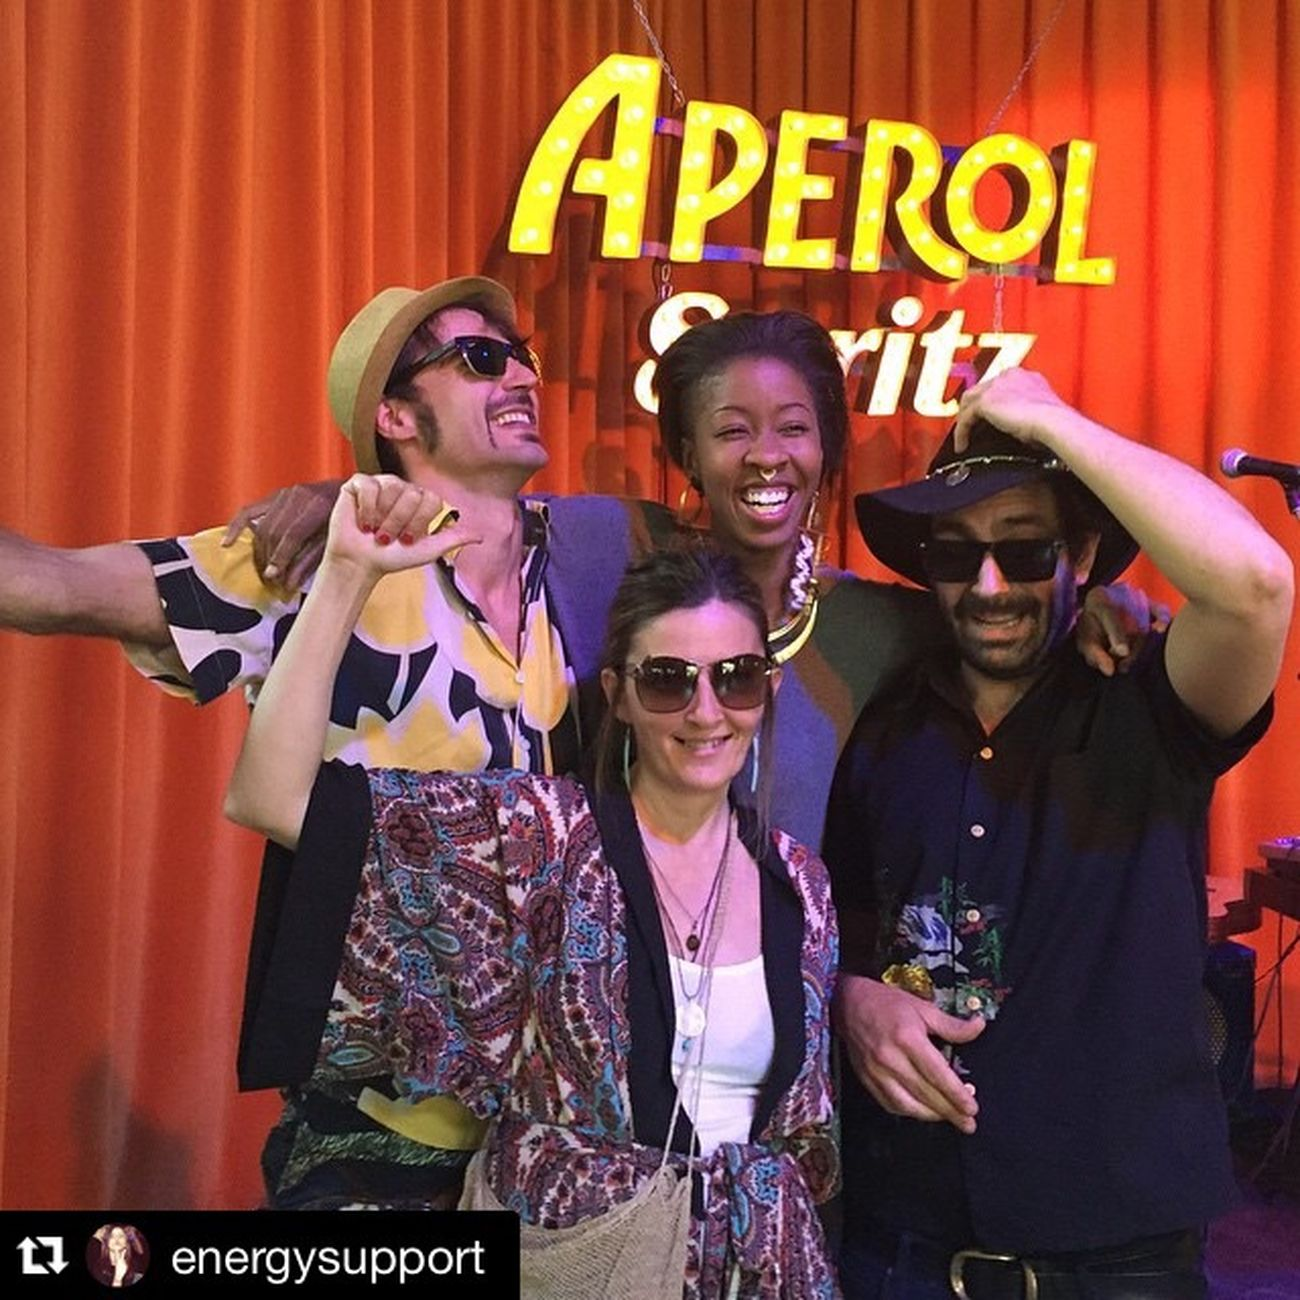 #Repost @energysupport with @repostapp. ・・・ #leonzelig & #golfodeguinea #dj #music @paloaltomarket #paloaltomarket #streetmusic #aperolspritz ¿Te lo vas a perder? Photo Credit 🎵📷#sandraenergysupport @borisrimbau #scoopcomunicacion 😏PaloAltoMarket #isidreestevez @AperolSpain 👍🏻 7Edición(especial) Palo Alto Market siempre aporta en todos los niveles 🔊🔊Difusión total! #scoopcomunicacion📢📢📢 Paloaltomarket Djs Streetmusic Streetmarket Buenrollo Friends Sandraenergysupport Weekend Music Aperol Spritz